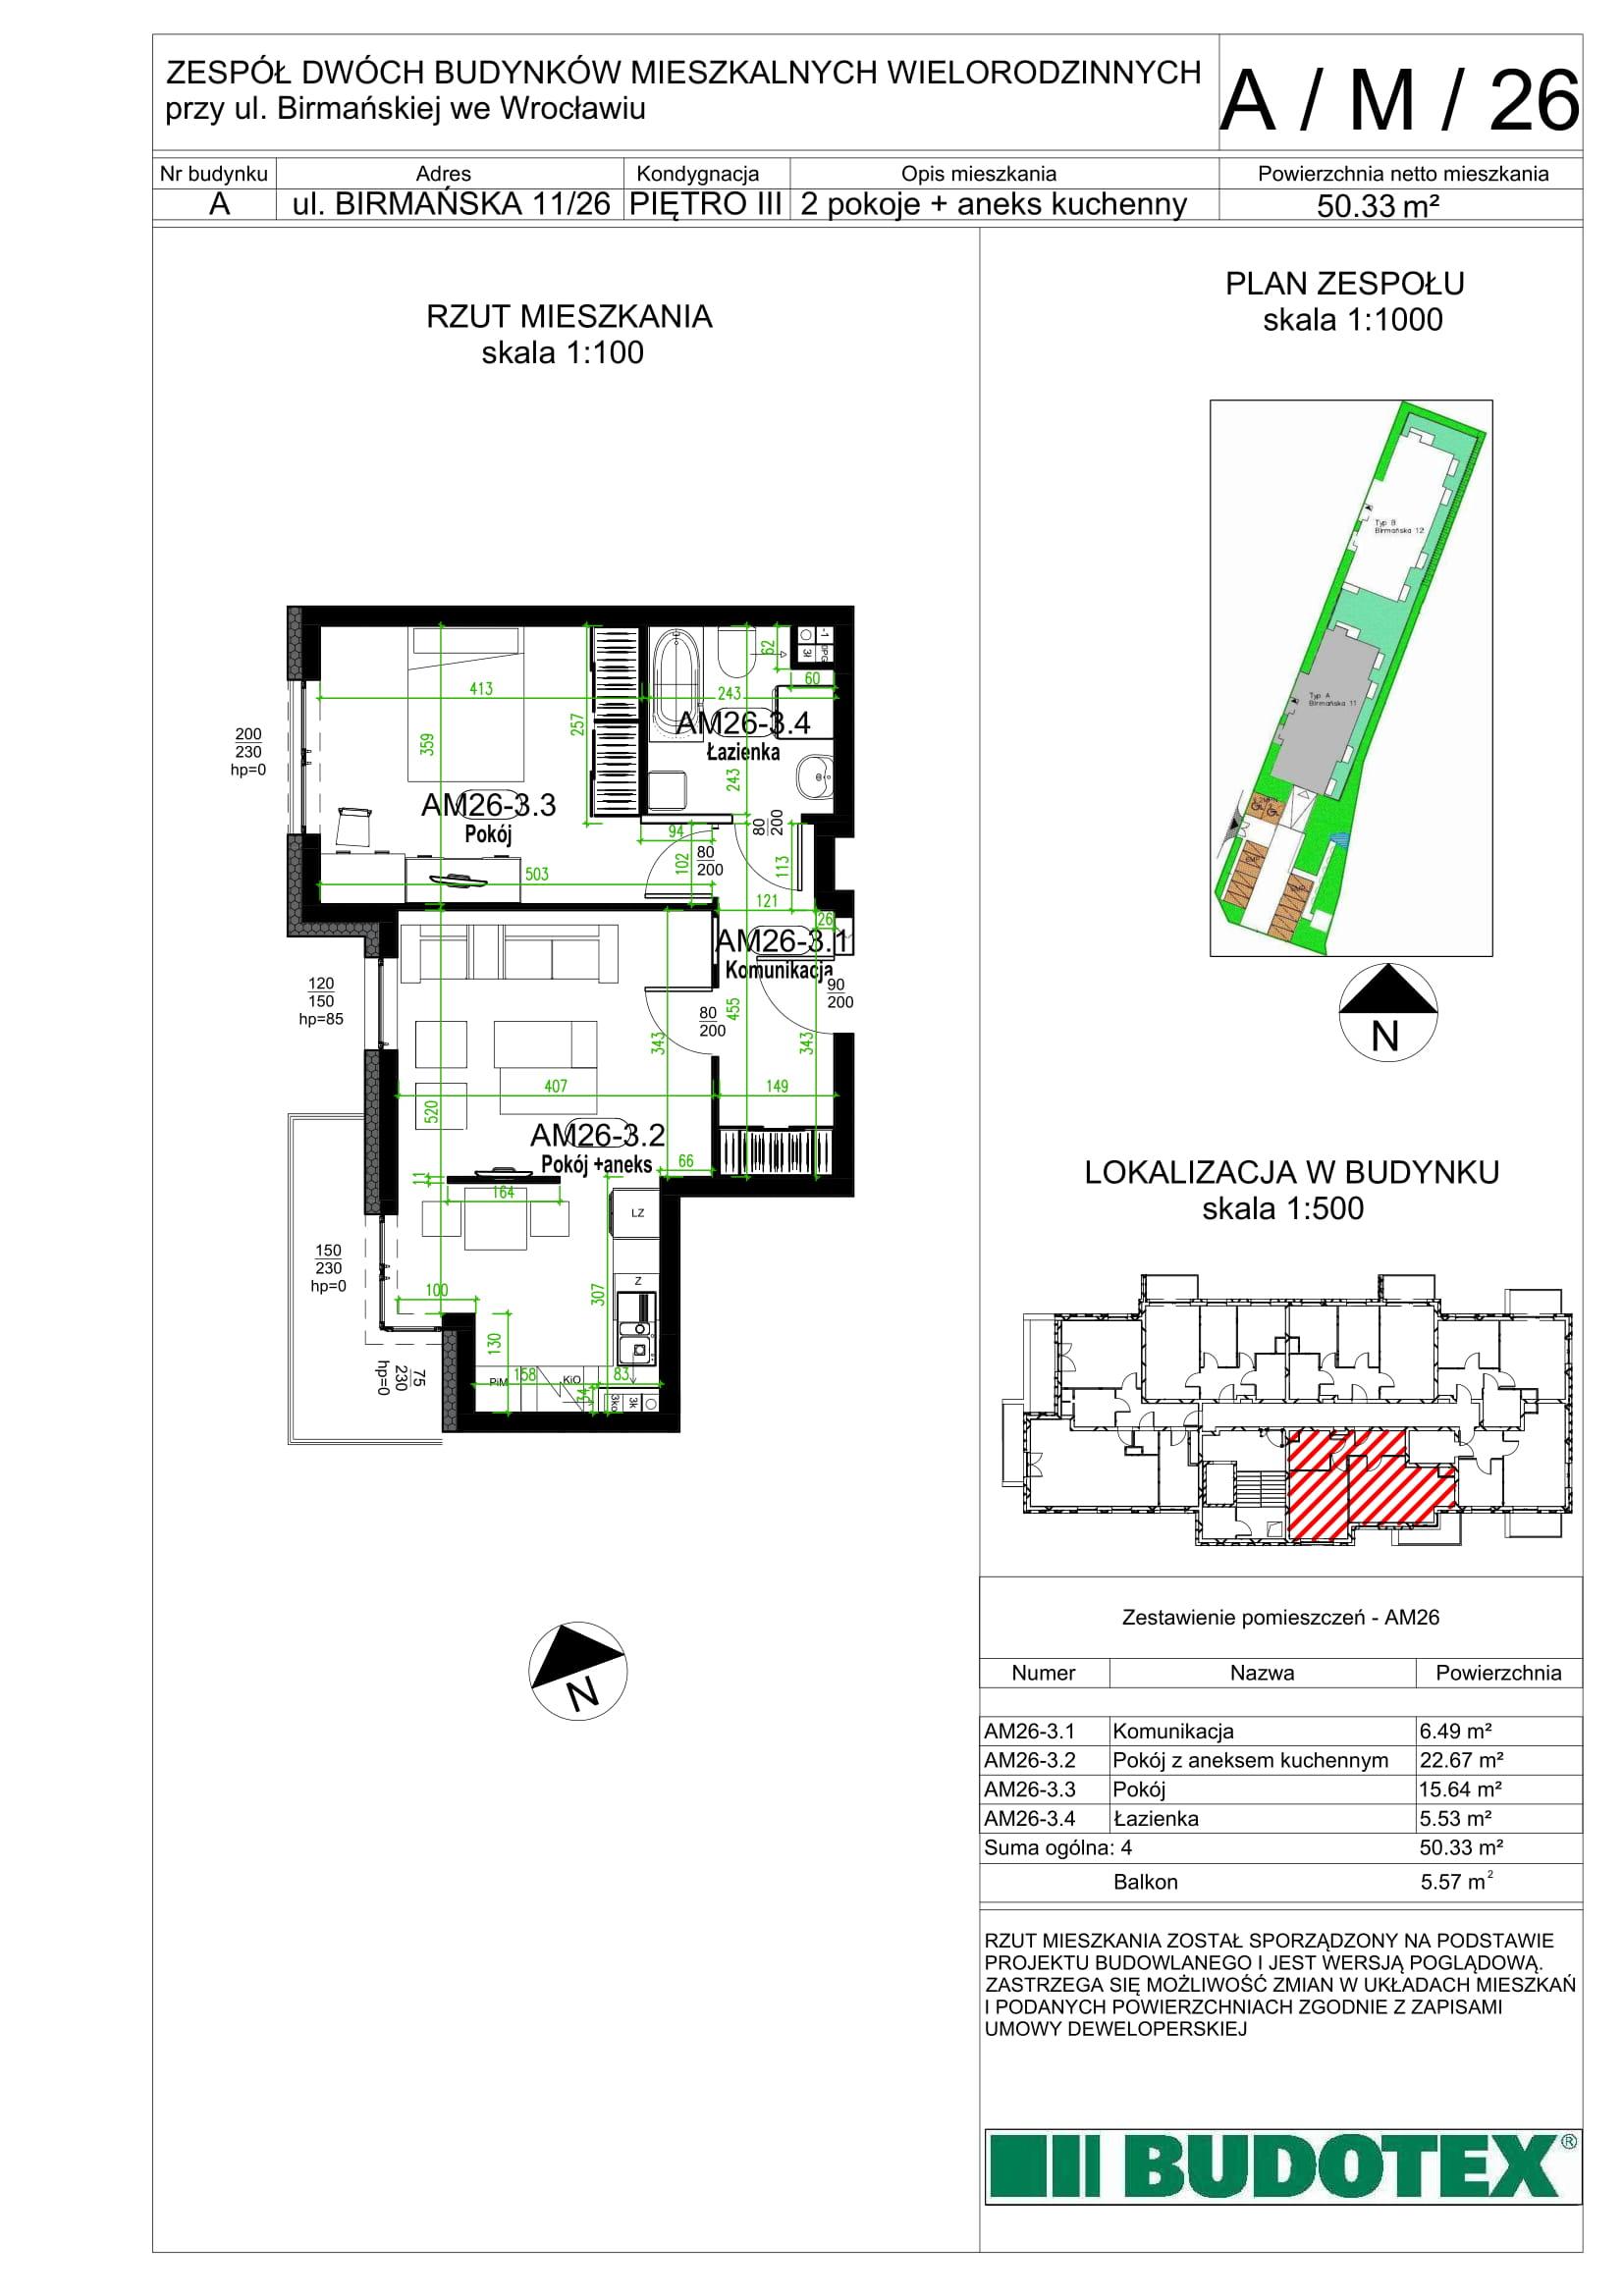 Mieszkanie nr A/M/26